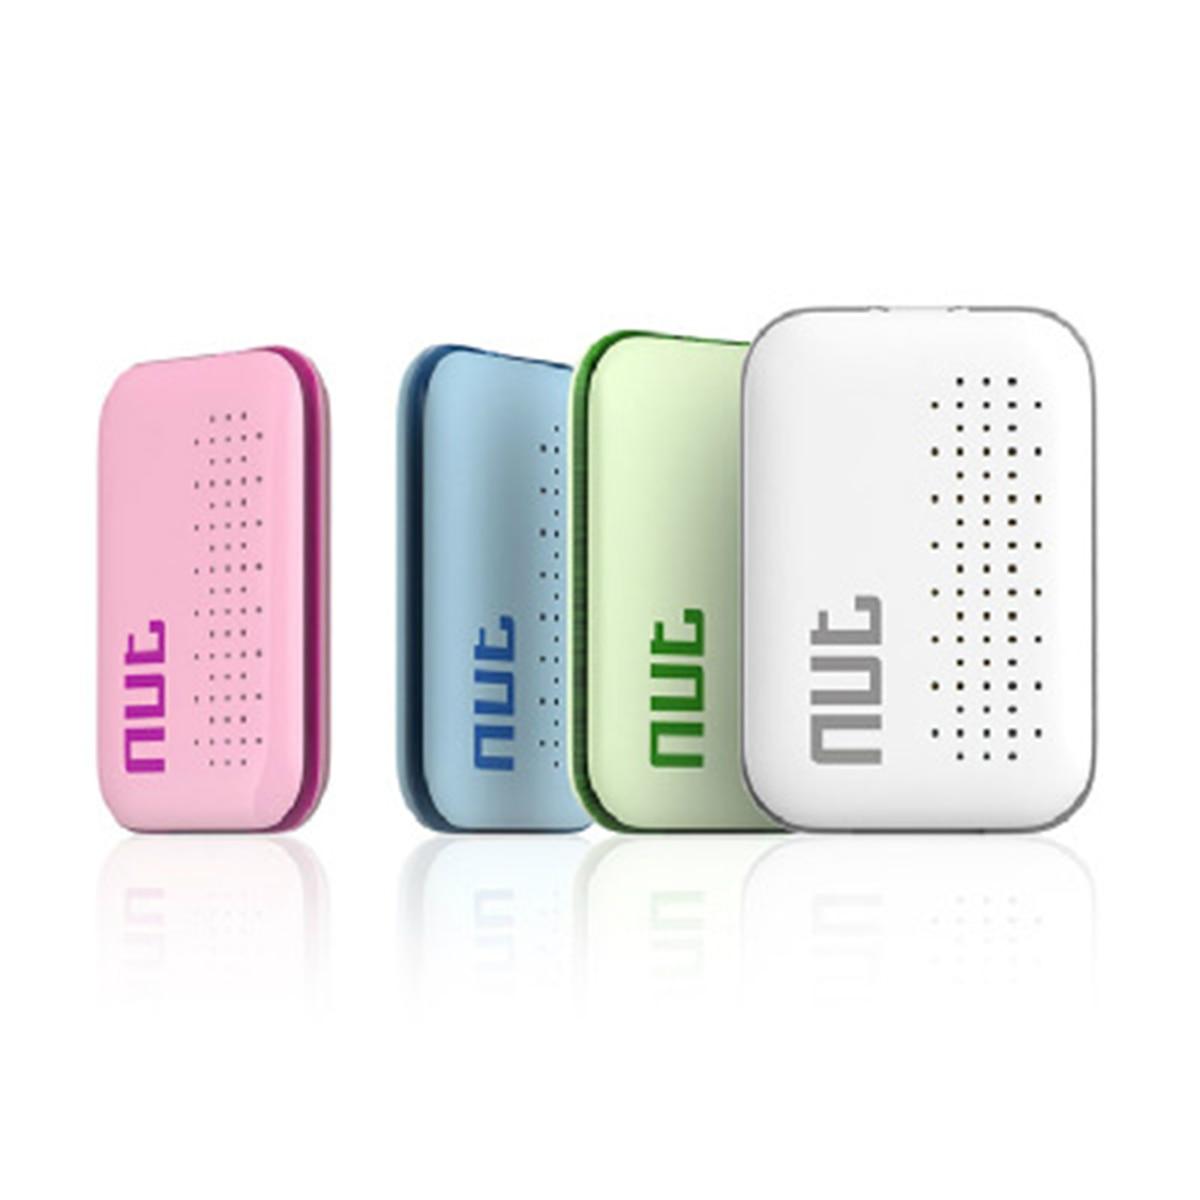 Nut 3 Mini Tag GPS Tracker Smart Bluetooth GPS Key Finder Nut3 Anti-lost Tracker Locator Sensor Alarm For Wallet Phone